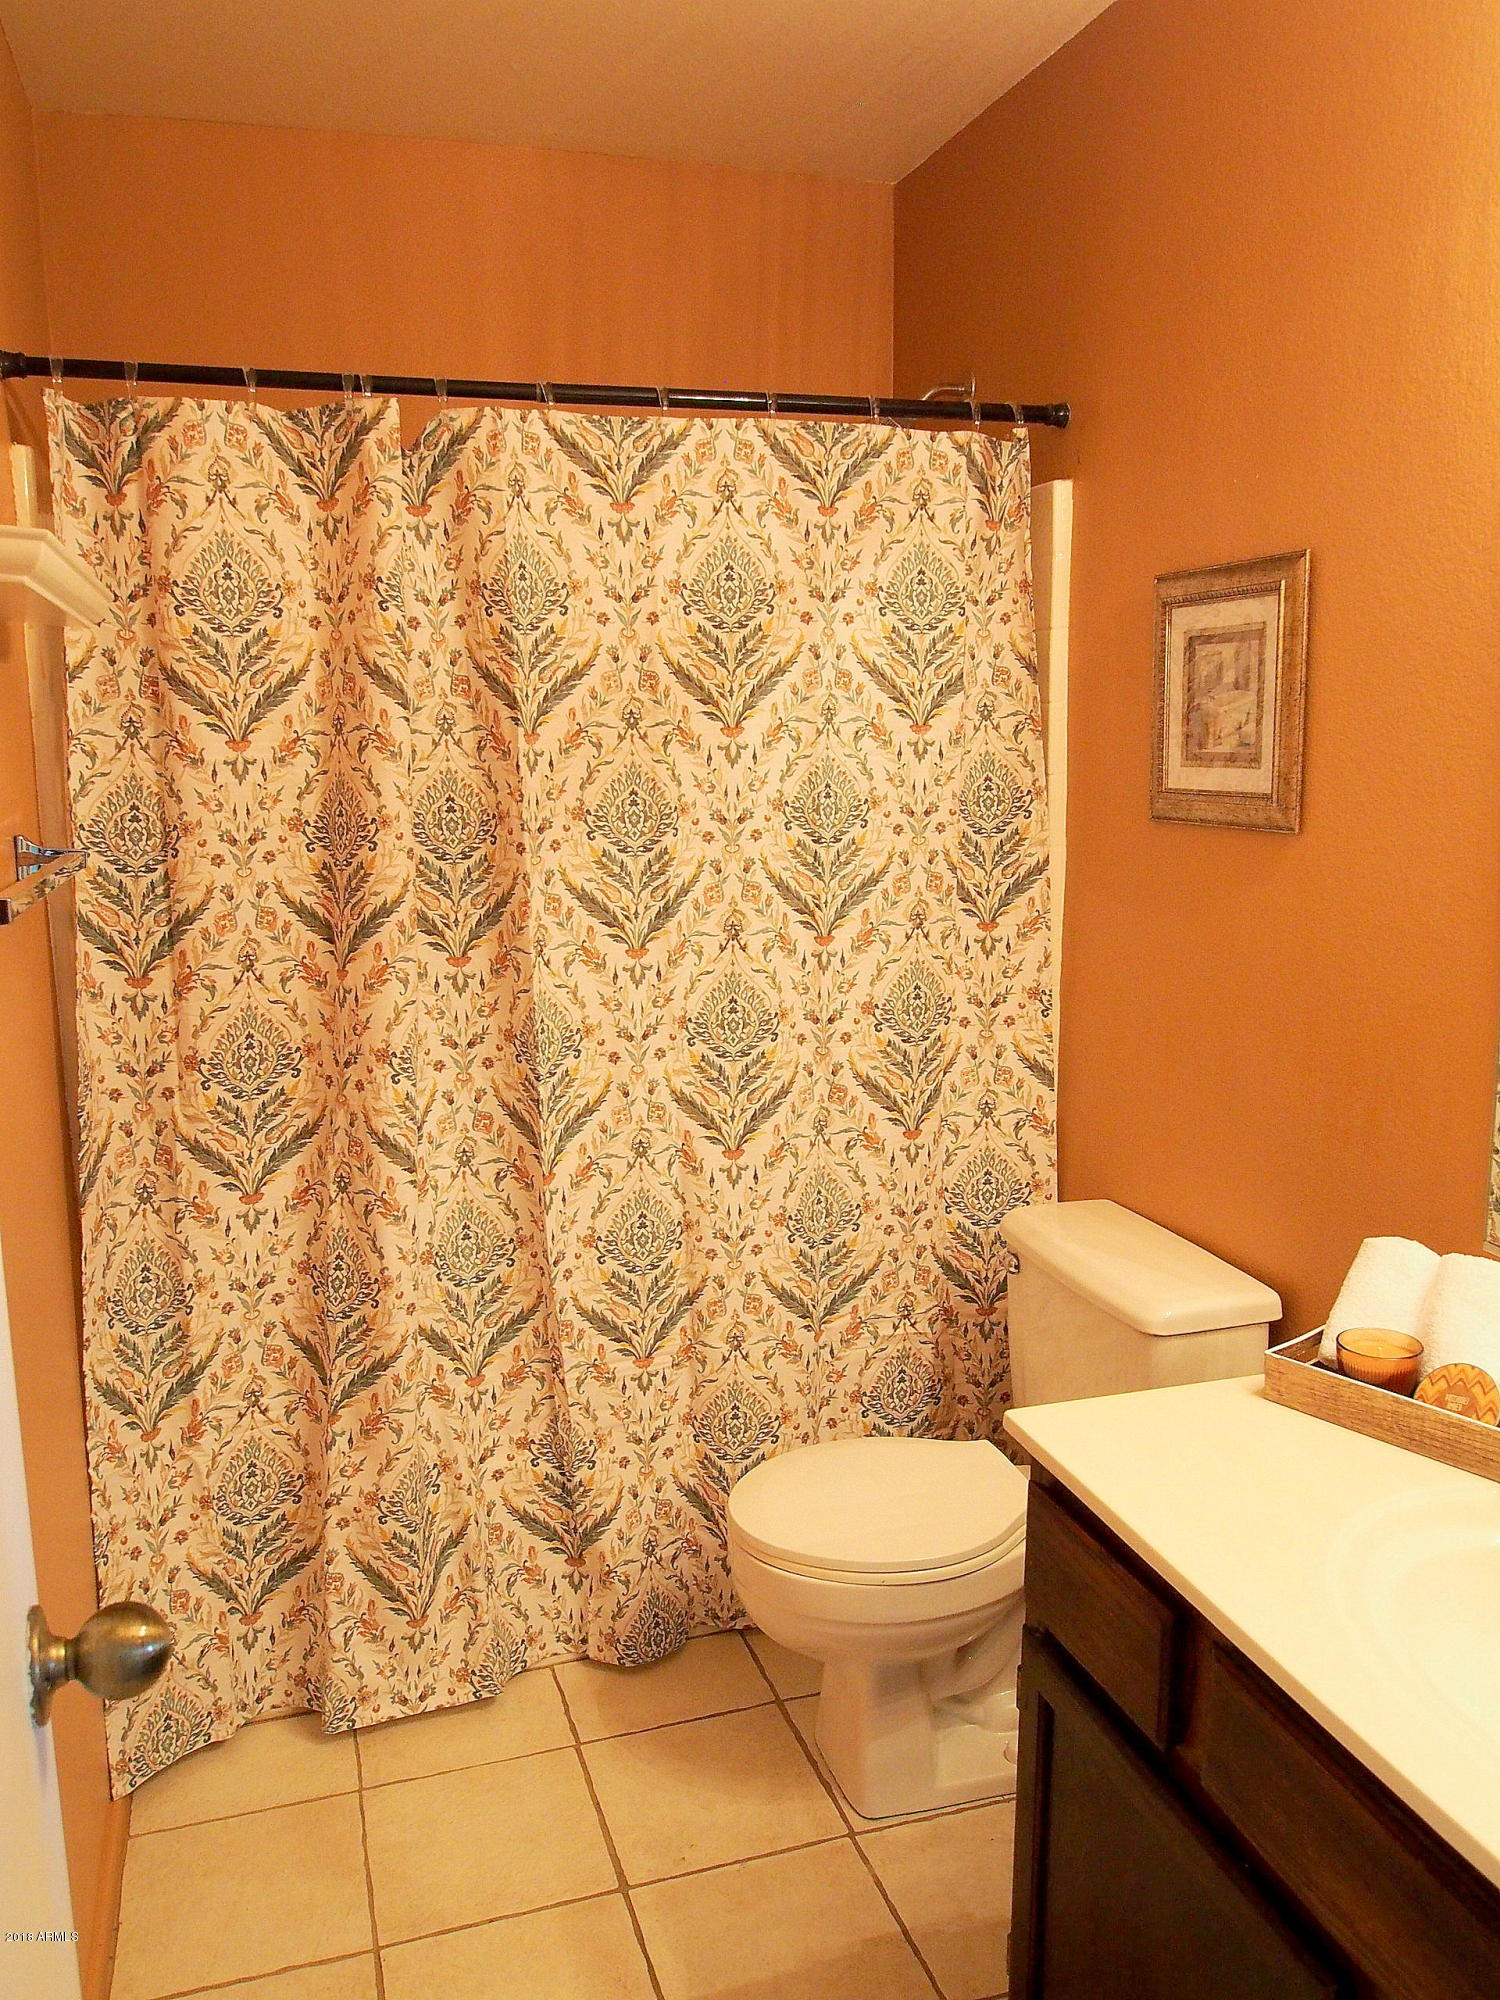 4037 E COOLBROOK Avenue Phoenix, AZ 85032 - MLS #: 5803261